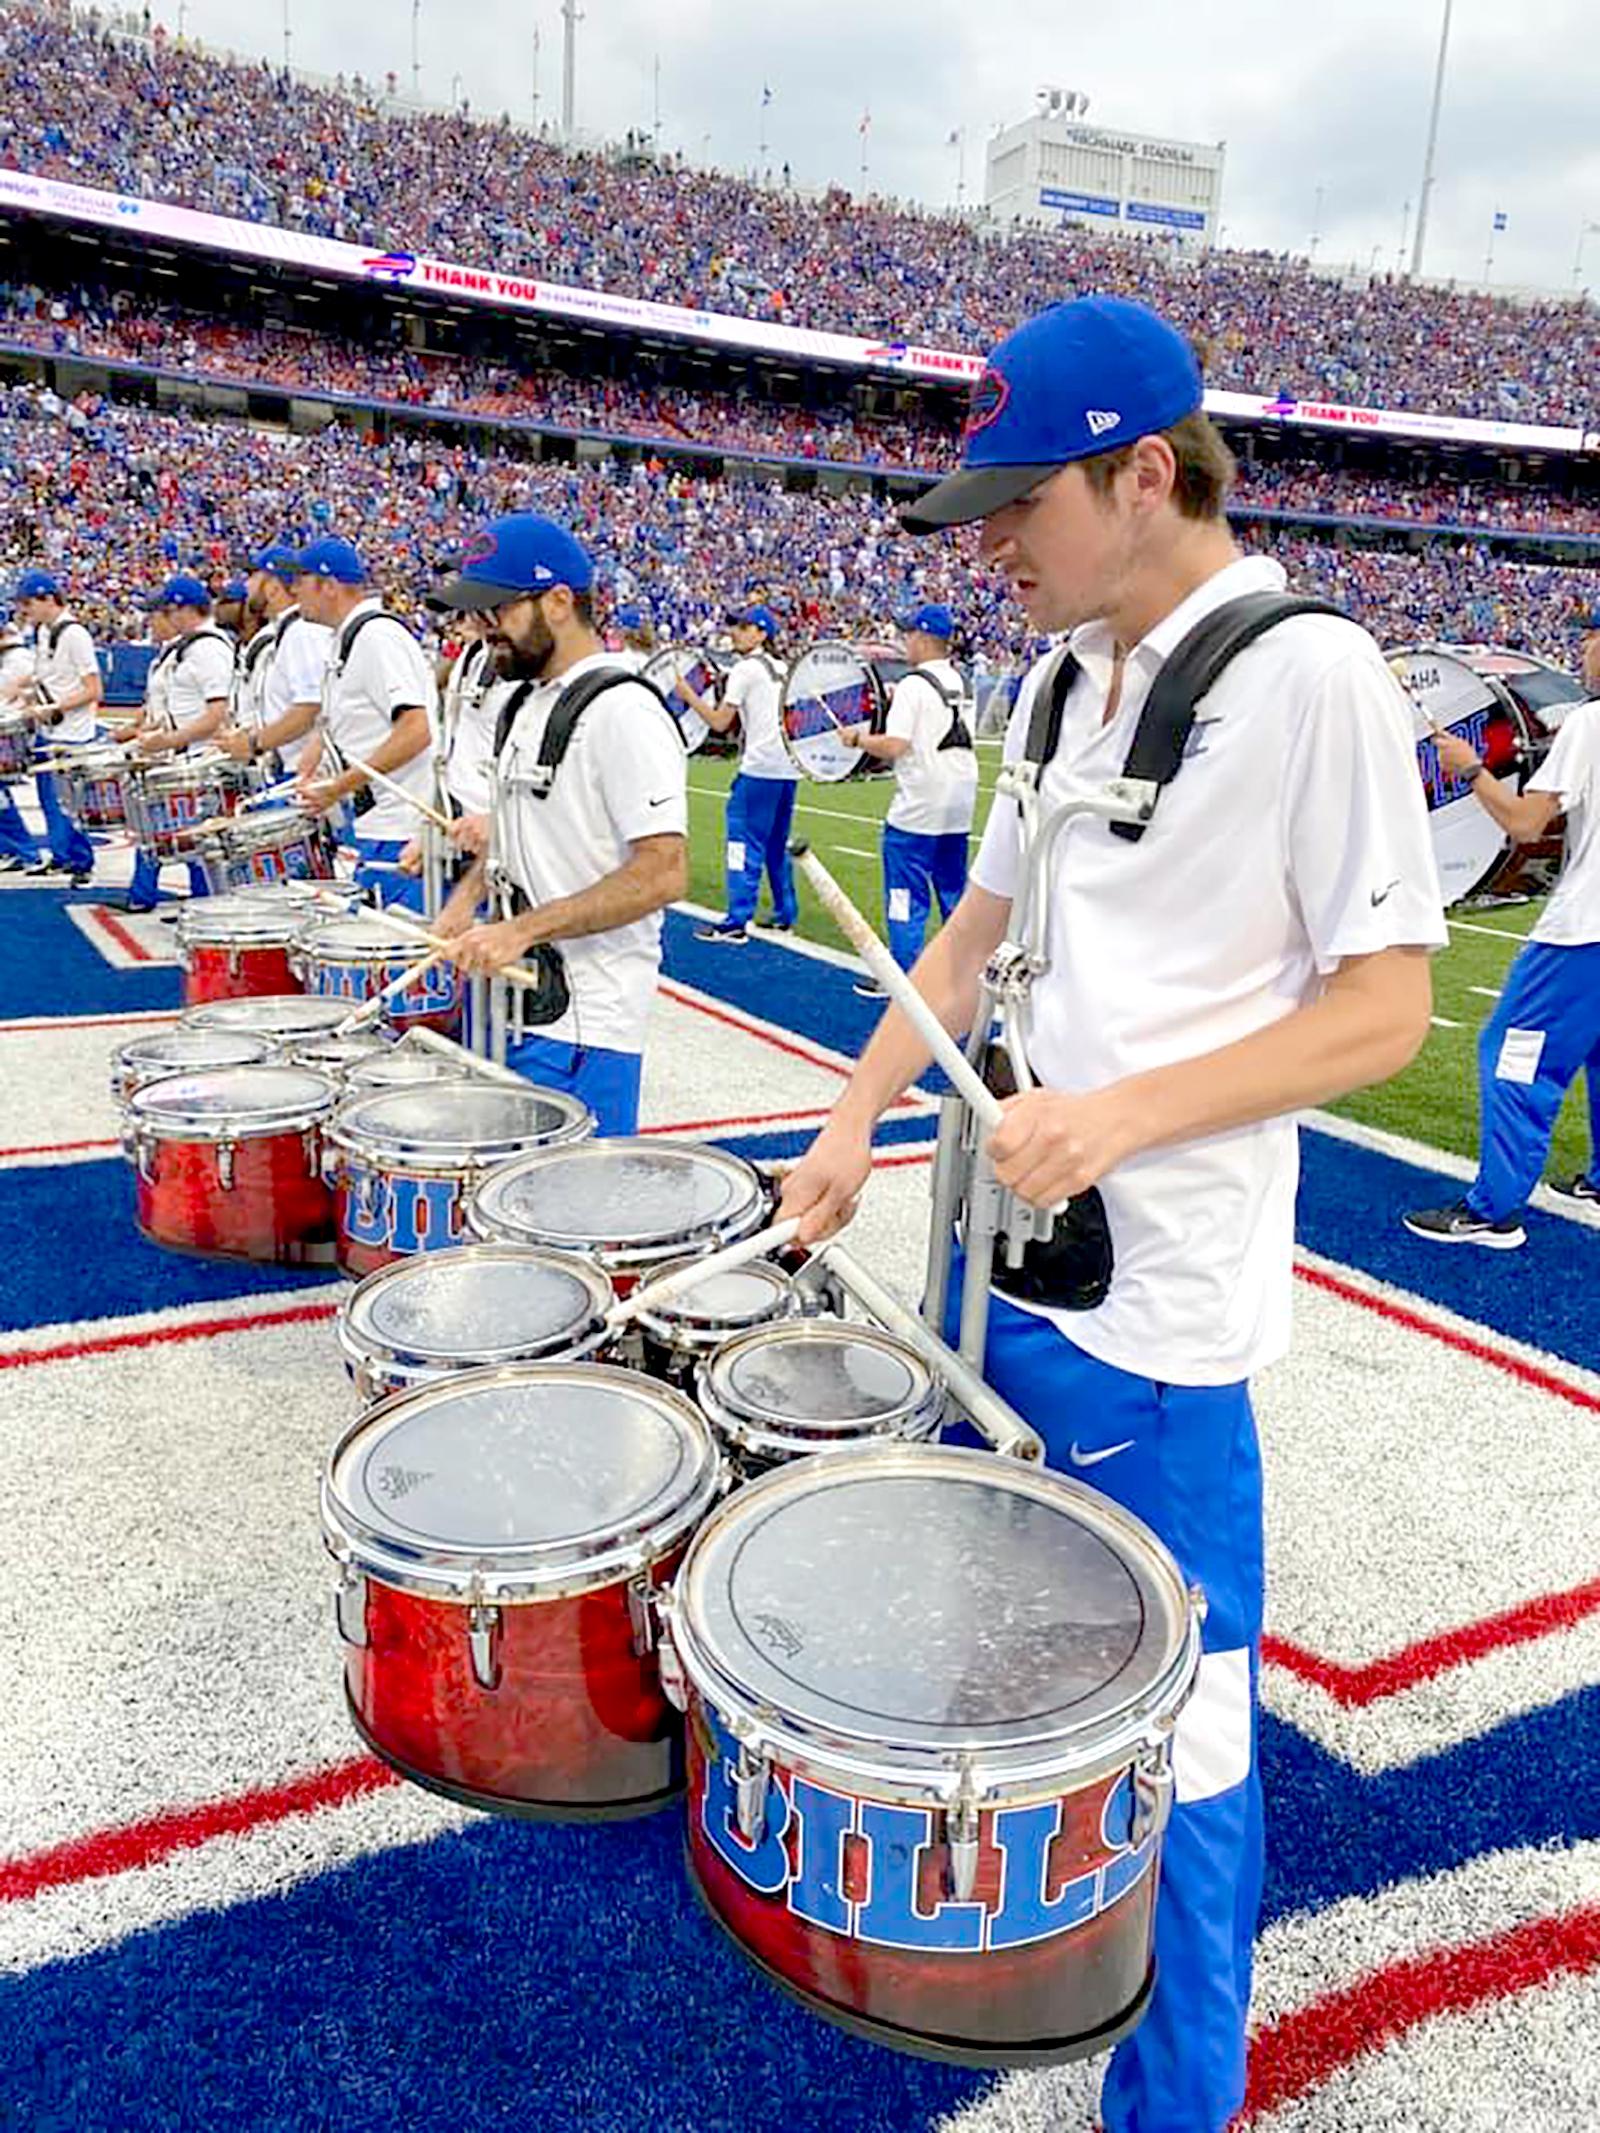 Stampede Drumline file photo